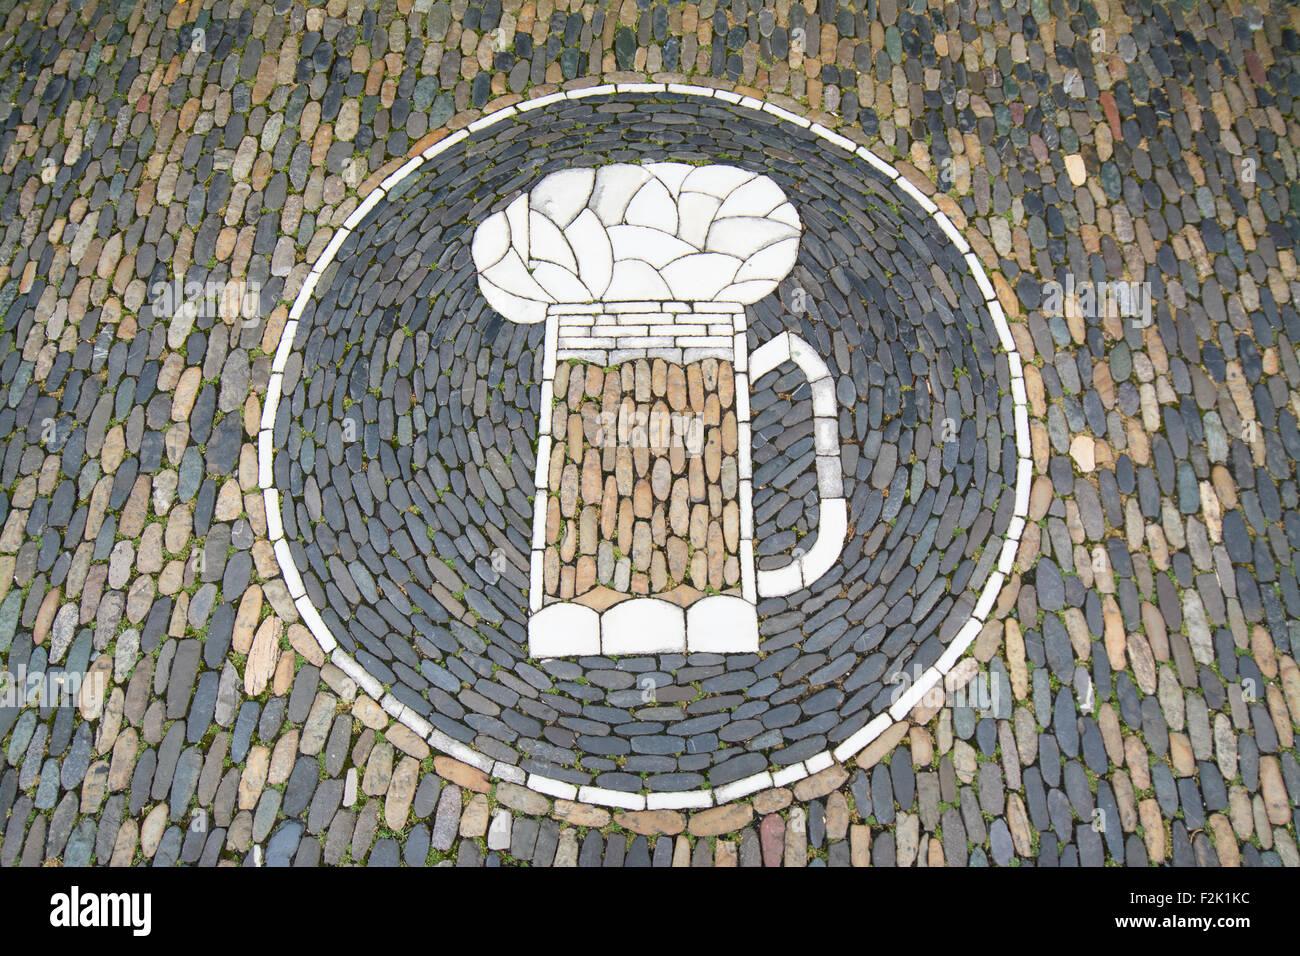 Freiburg, Baden-Württemberg, Deutschland - Pflaster Kunst Bierkrug Stockbild